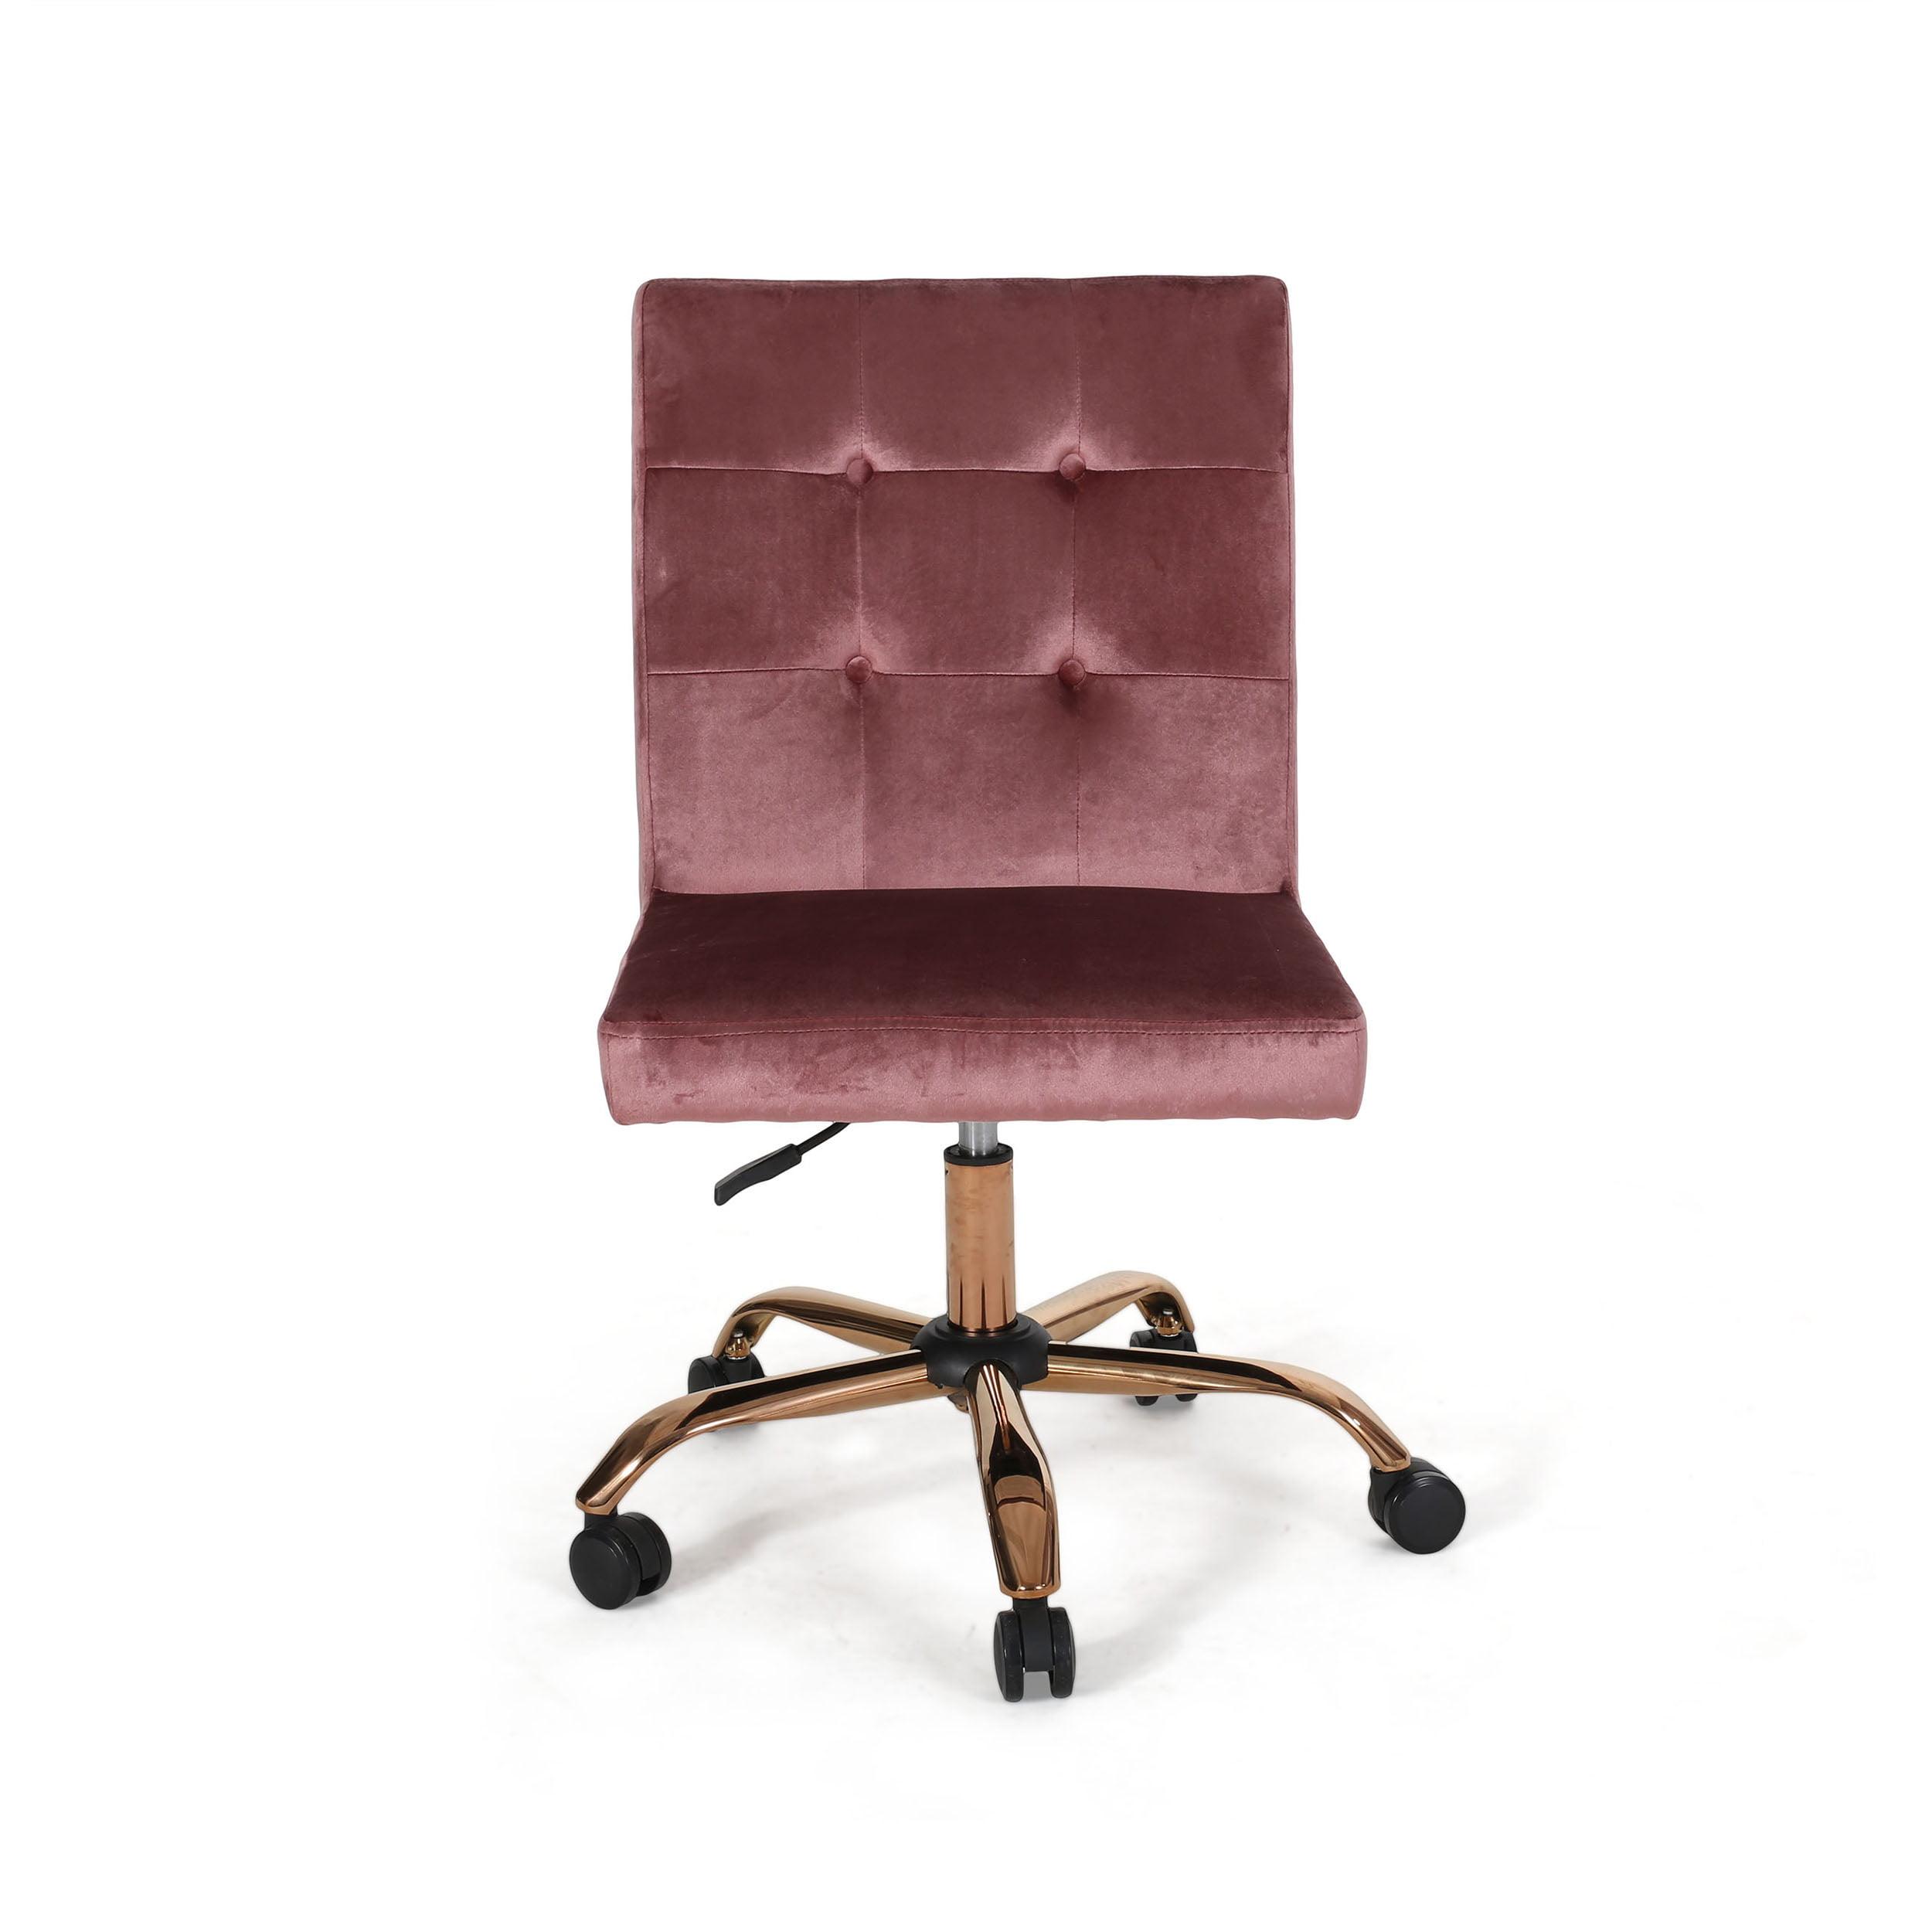 Noble House Yisroel Glam Tufted Home Office Chair With Swivel Base Blush Rose Gold Finish Walmart Com Walmart Com